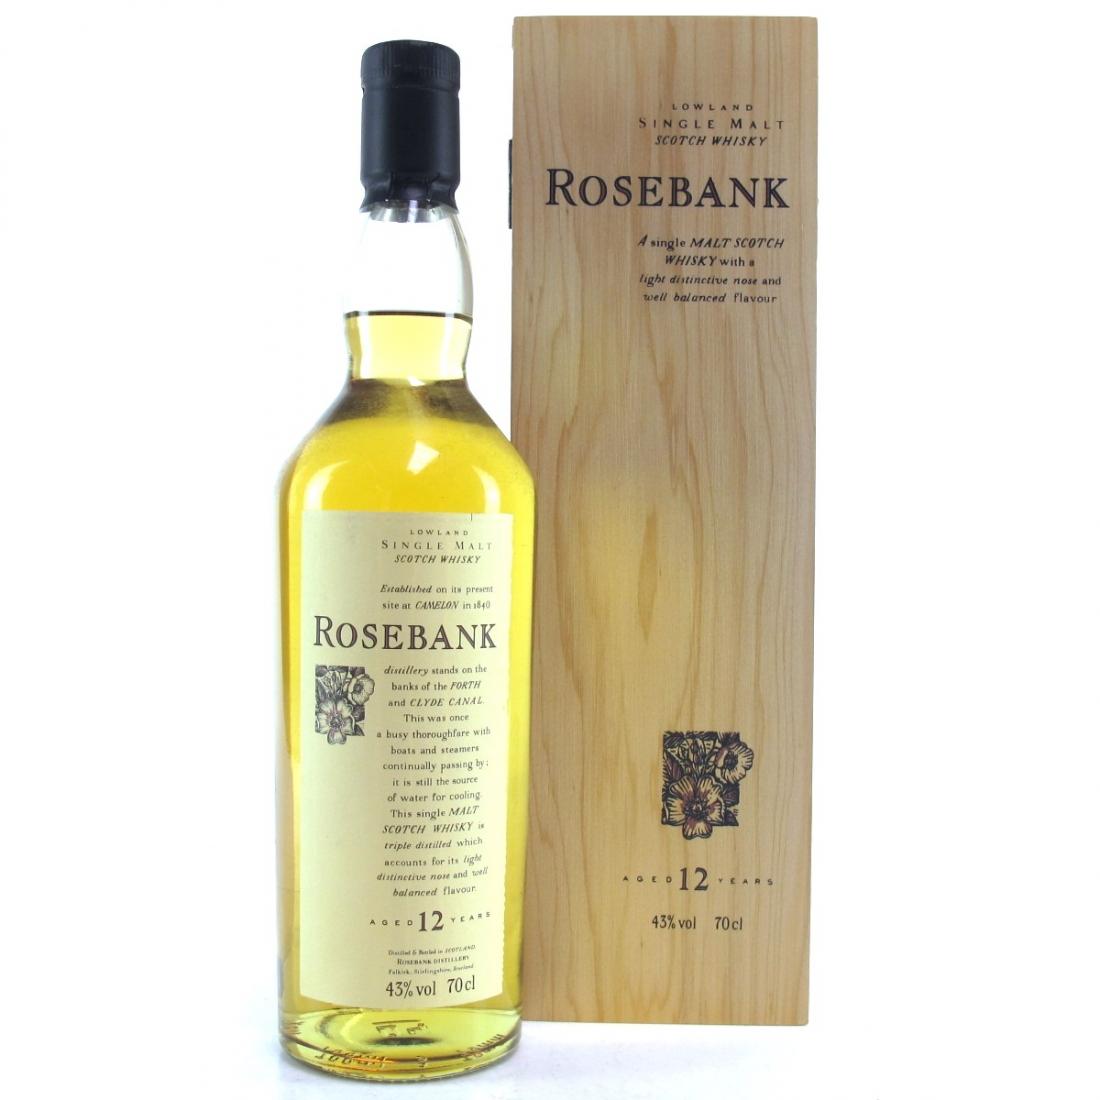 Rosebank 12 Year Old Flora and Fauna / Wooden Box